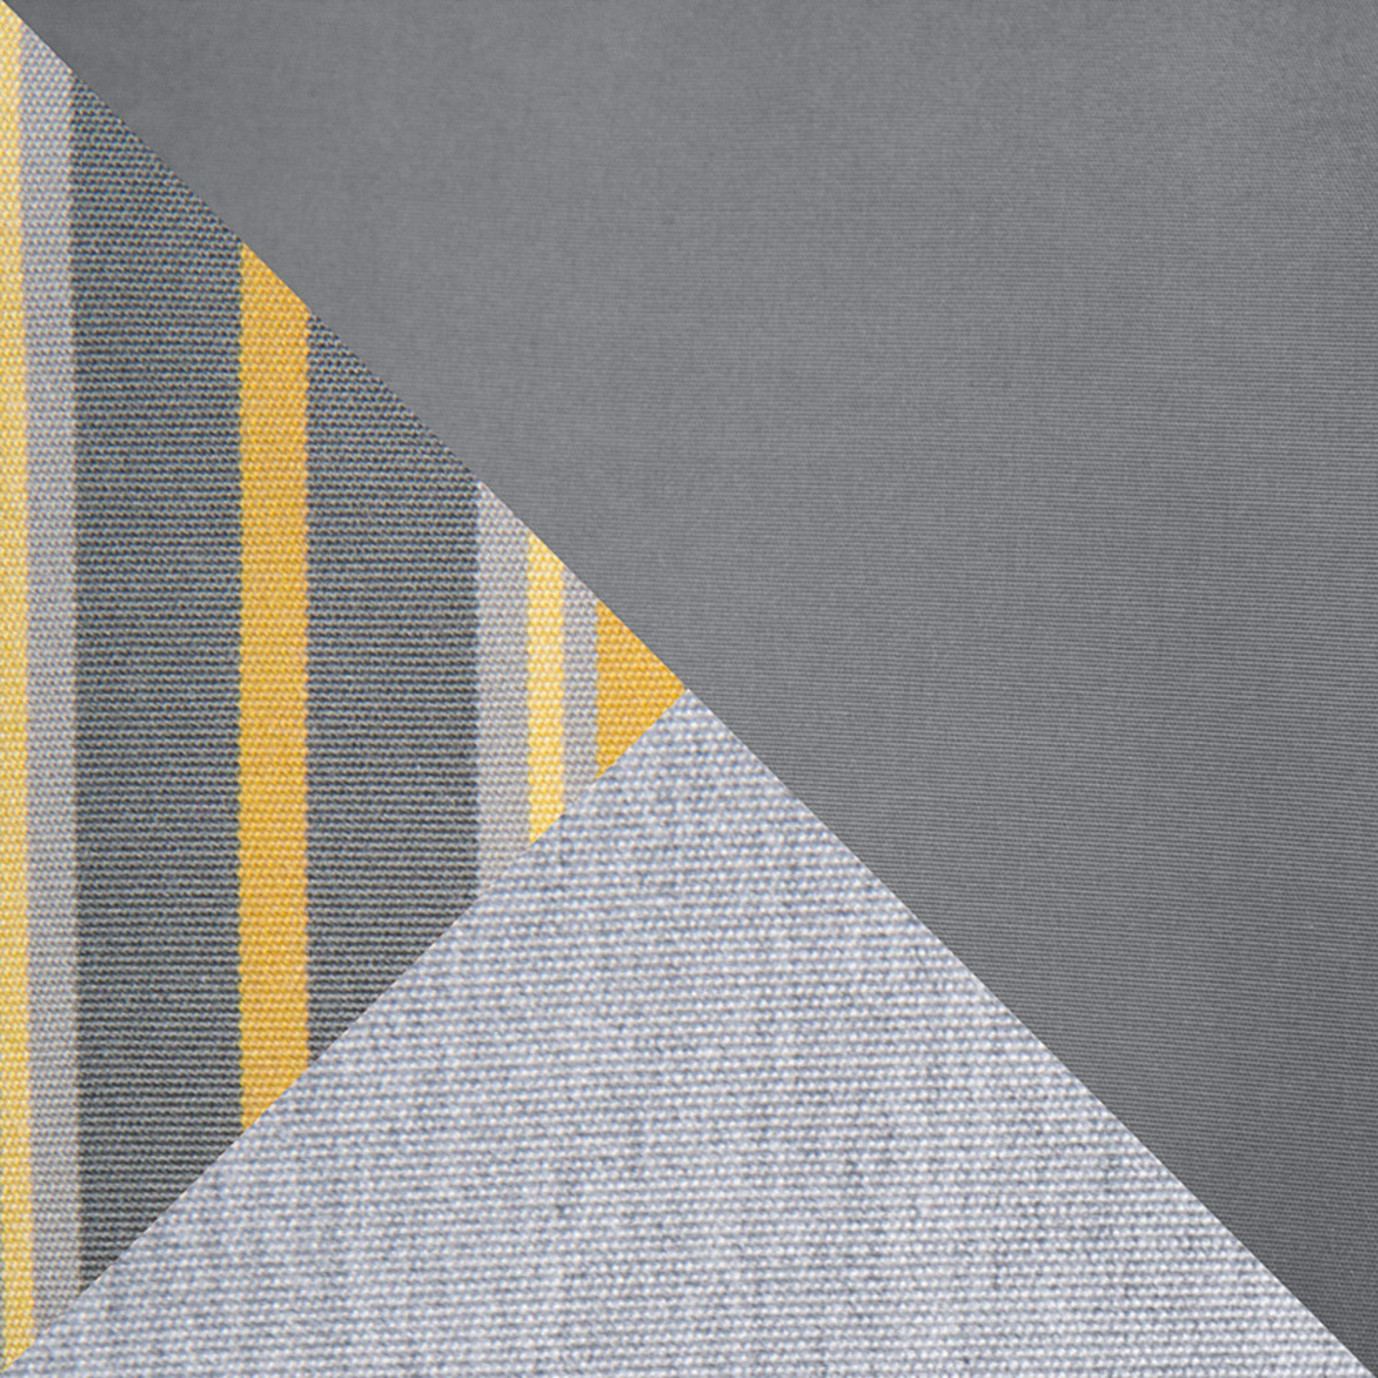 Milo™ Gray 8 Piece Motion Seating Set - Charcoal Gray